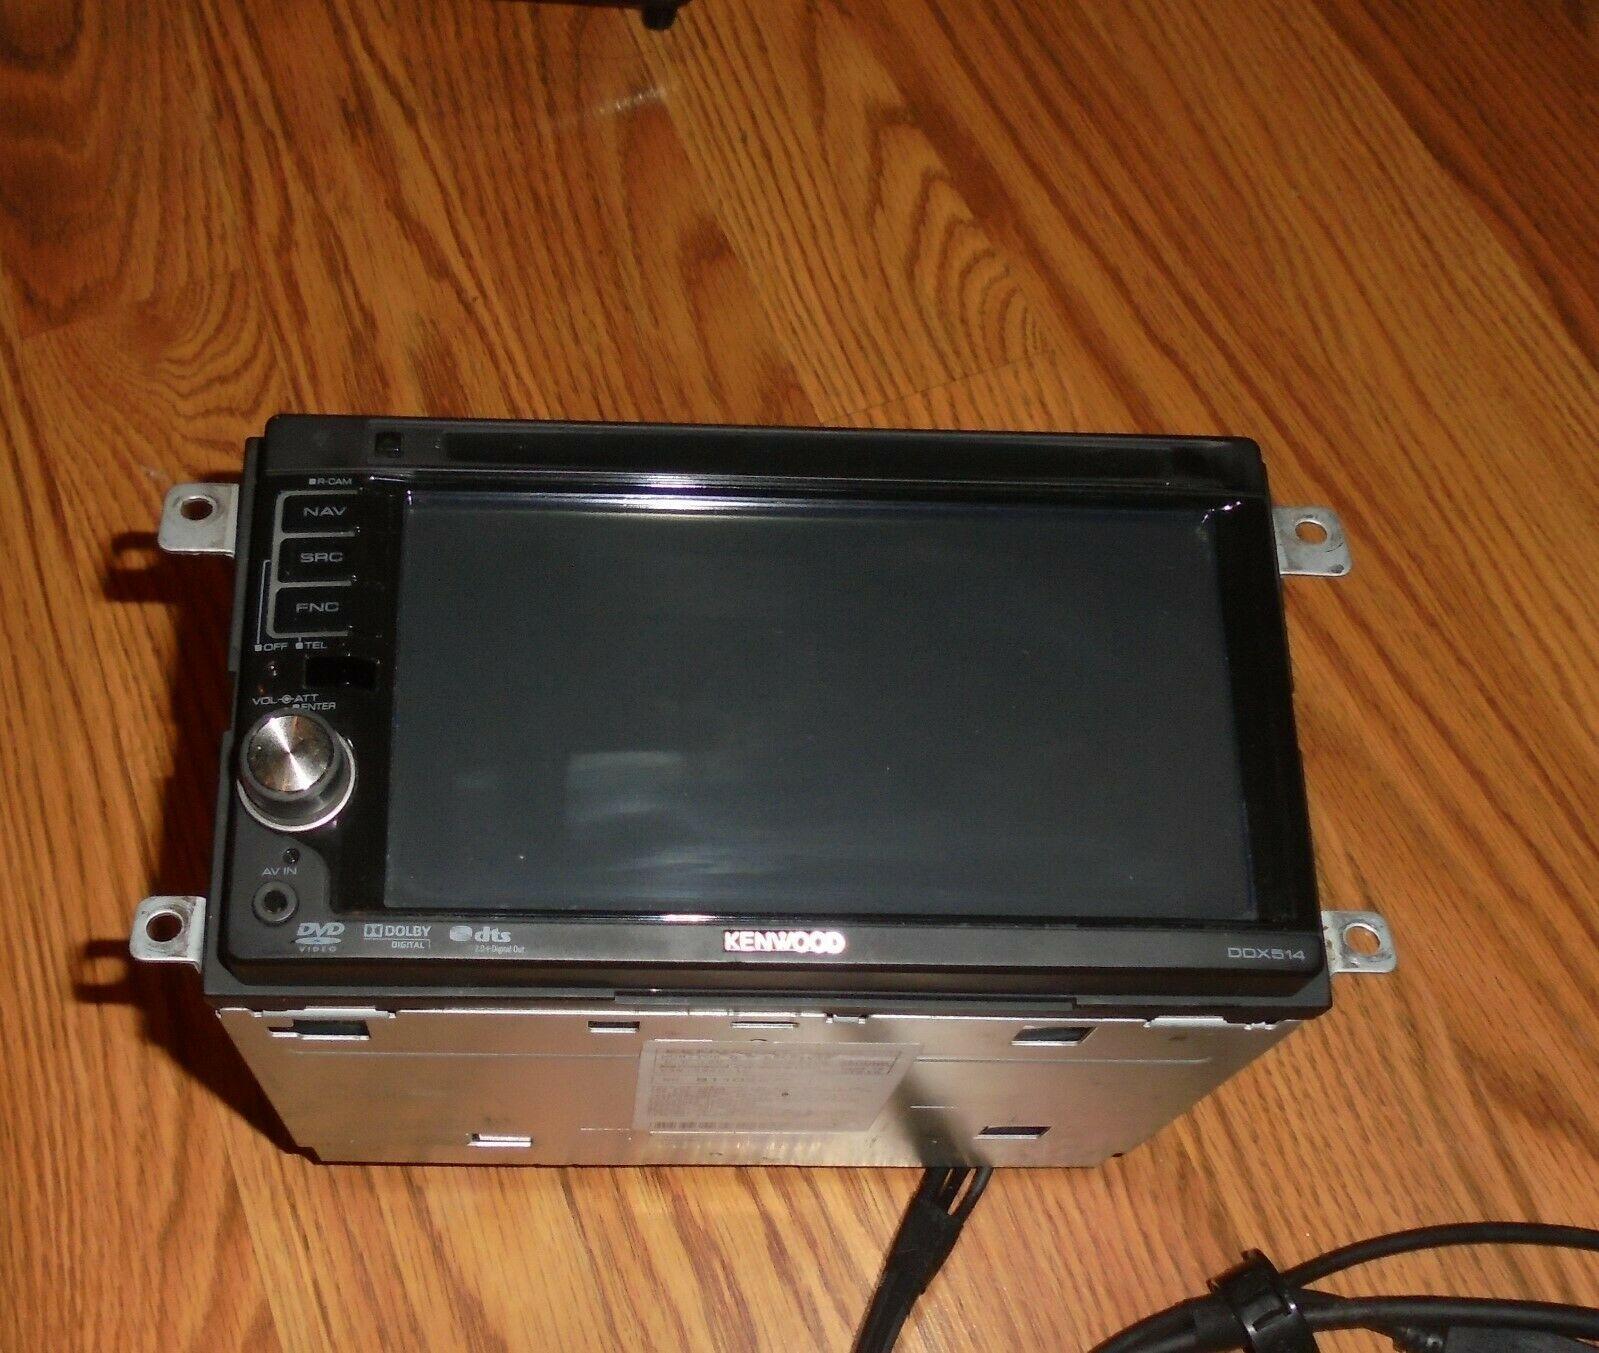 Kenwood DDX514 6.1-Inch Wide In-Dash Monitor DVD Recevier Broken For Parts